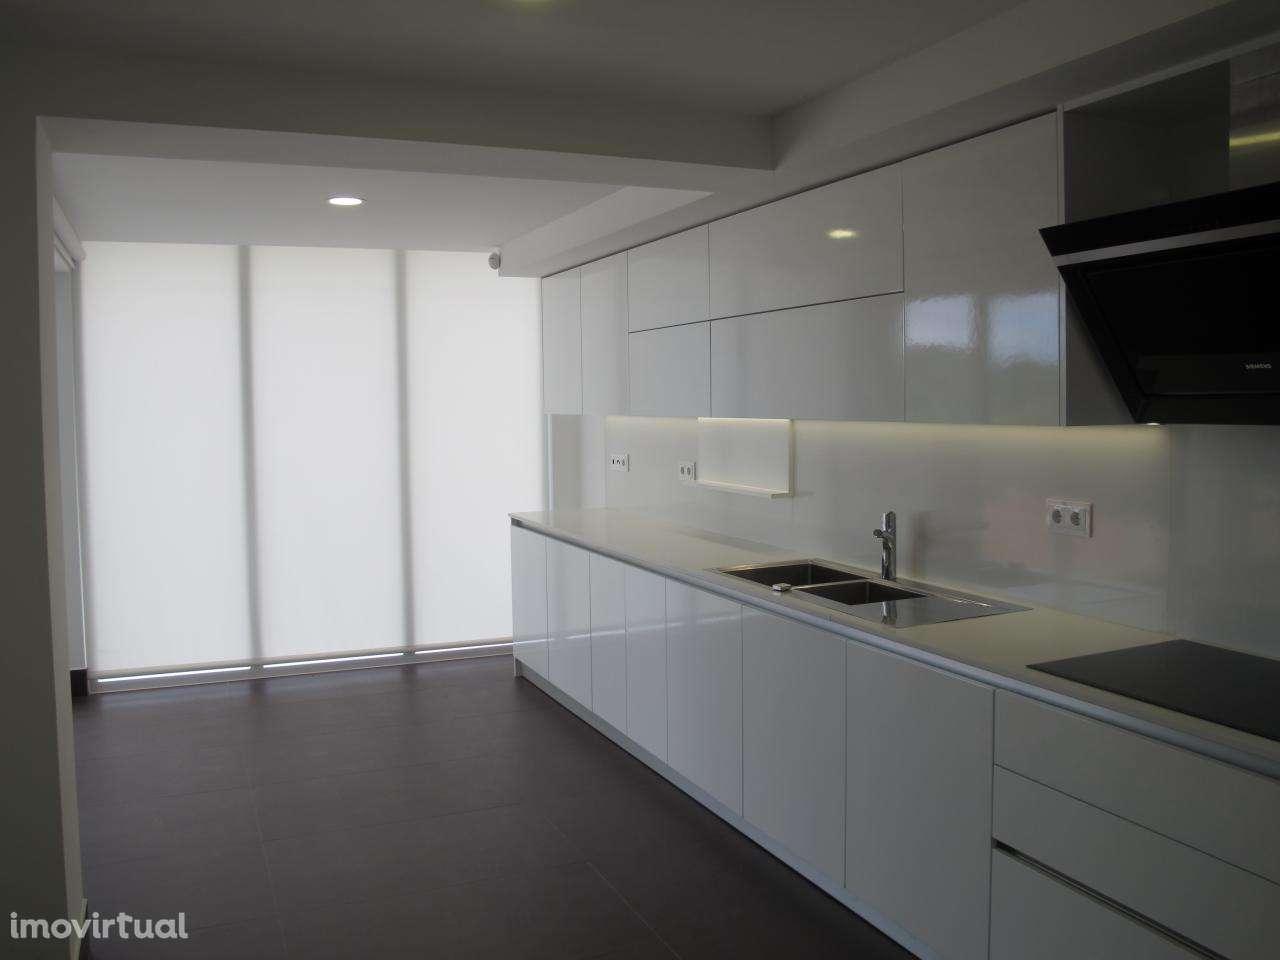 Apartamento para comprar, Cascais e Estoril, Cascais, Lisboa - Foto 10